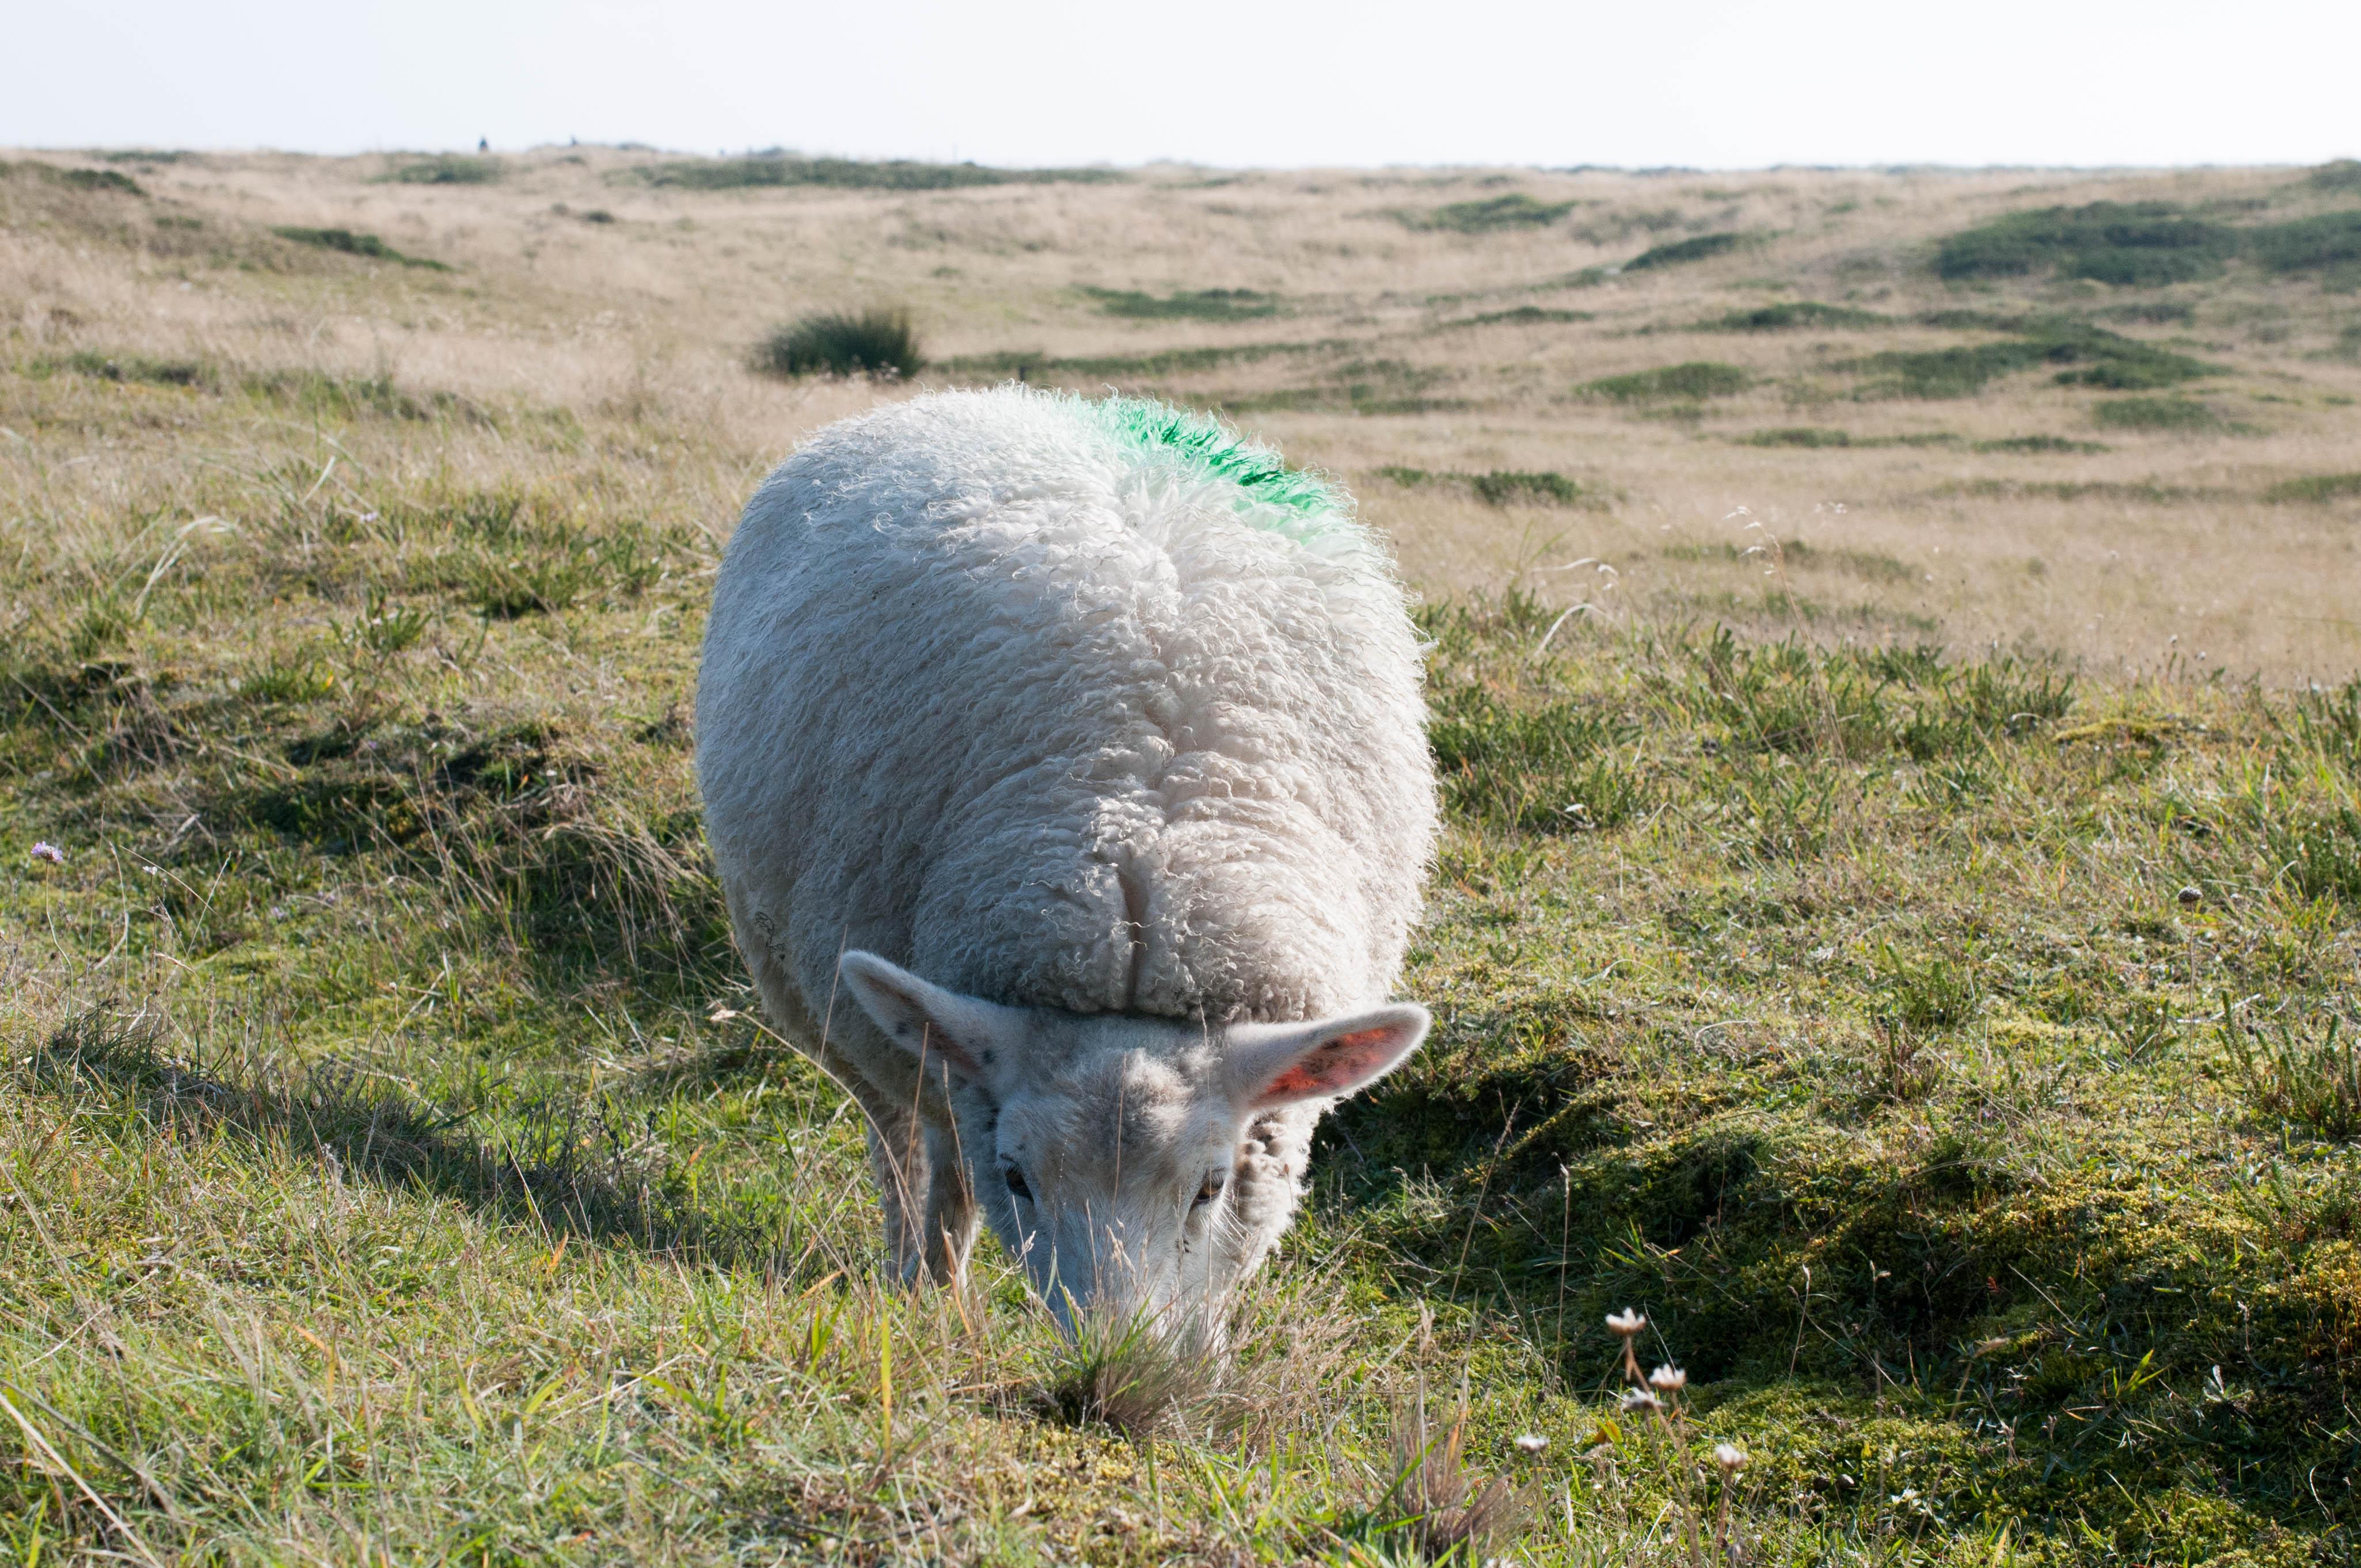 Schaf am Ellenbogen beim Grasen